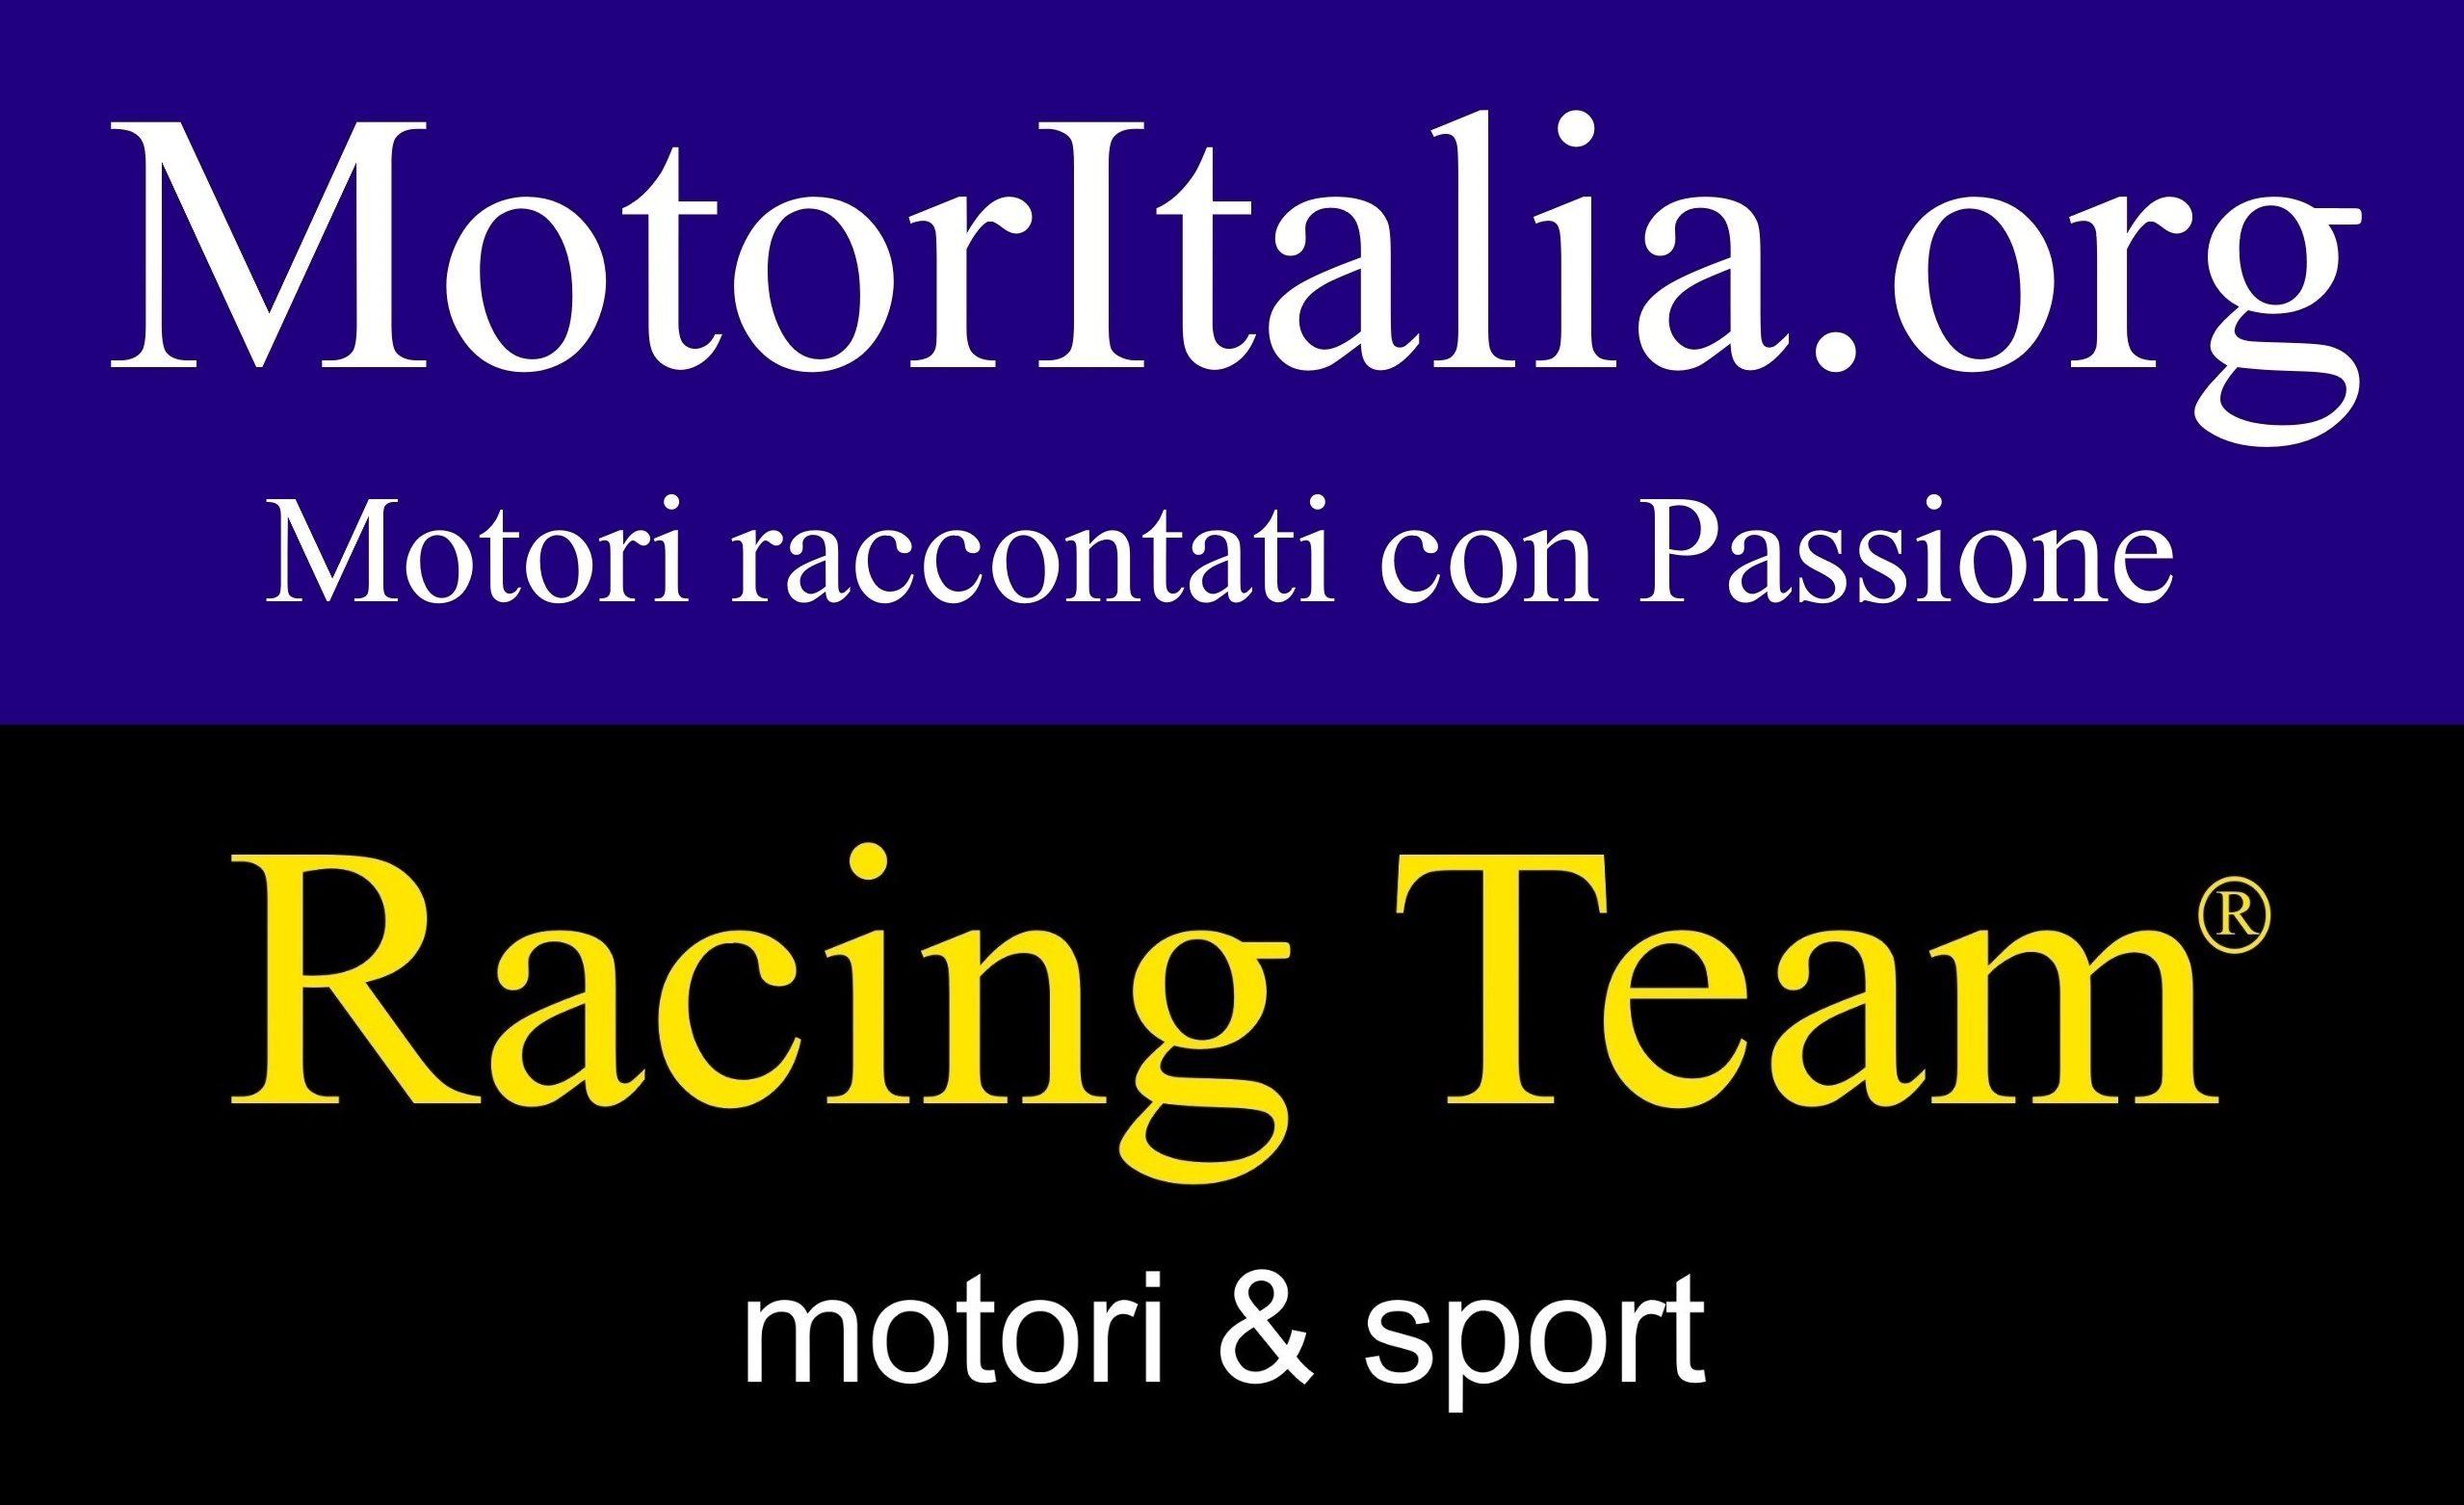 MOTORITALIA.org